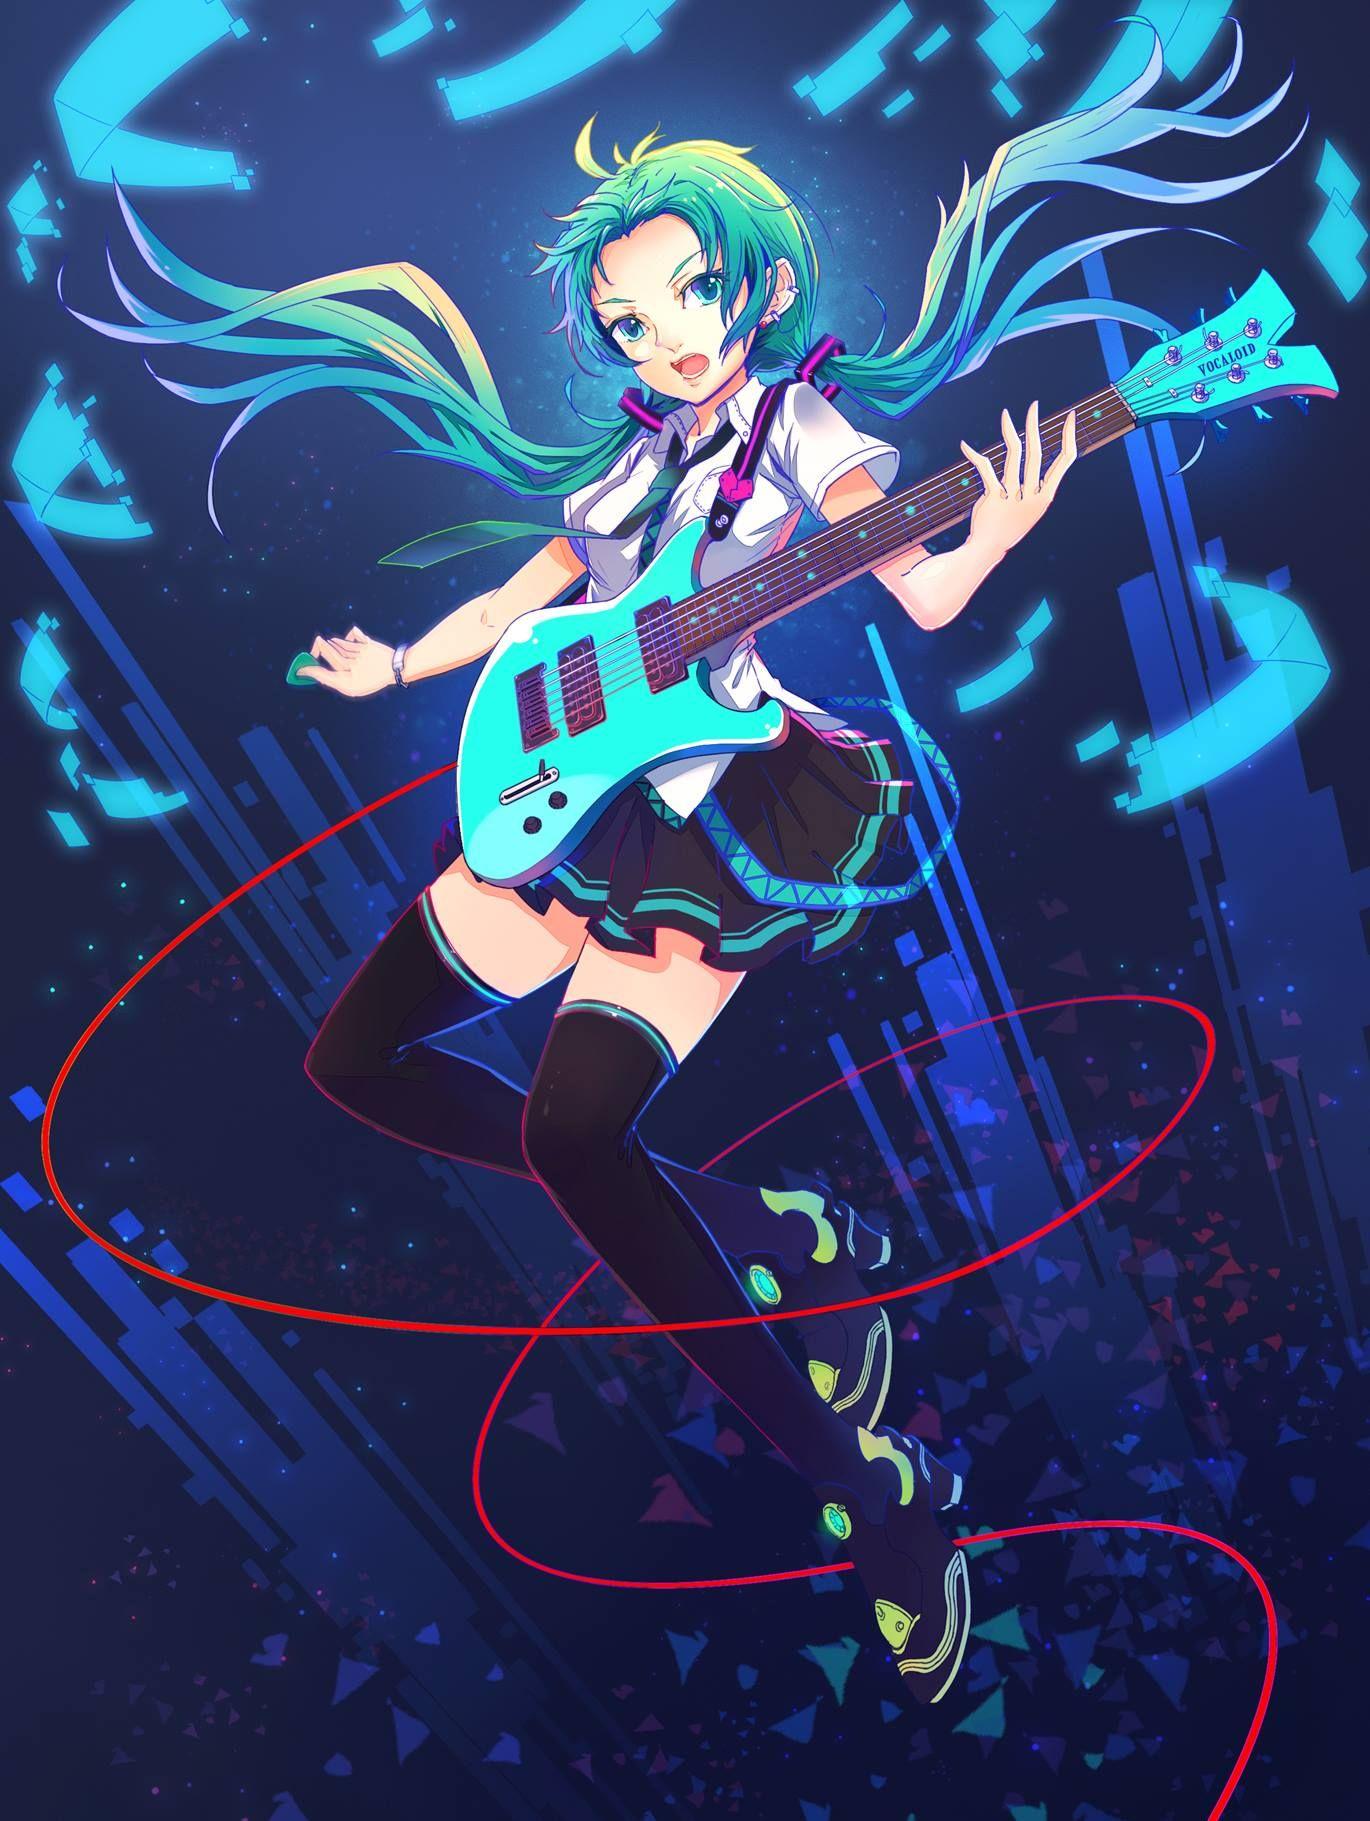 Vocaloid Hatsune Miku art by じゅん (Pixiv) Hatsune miku